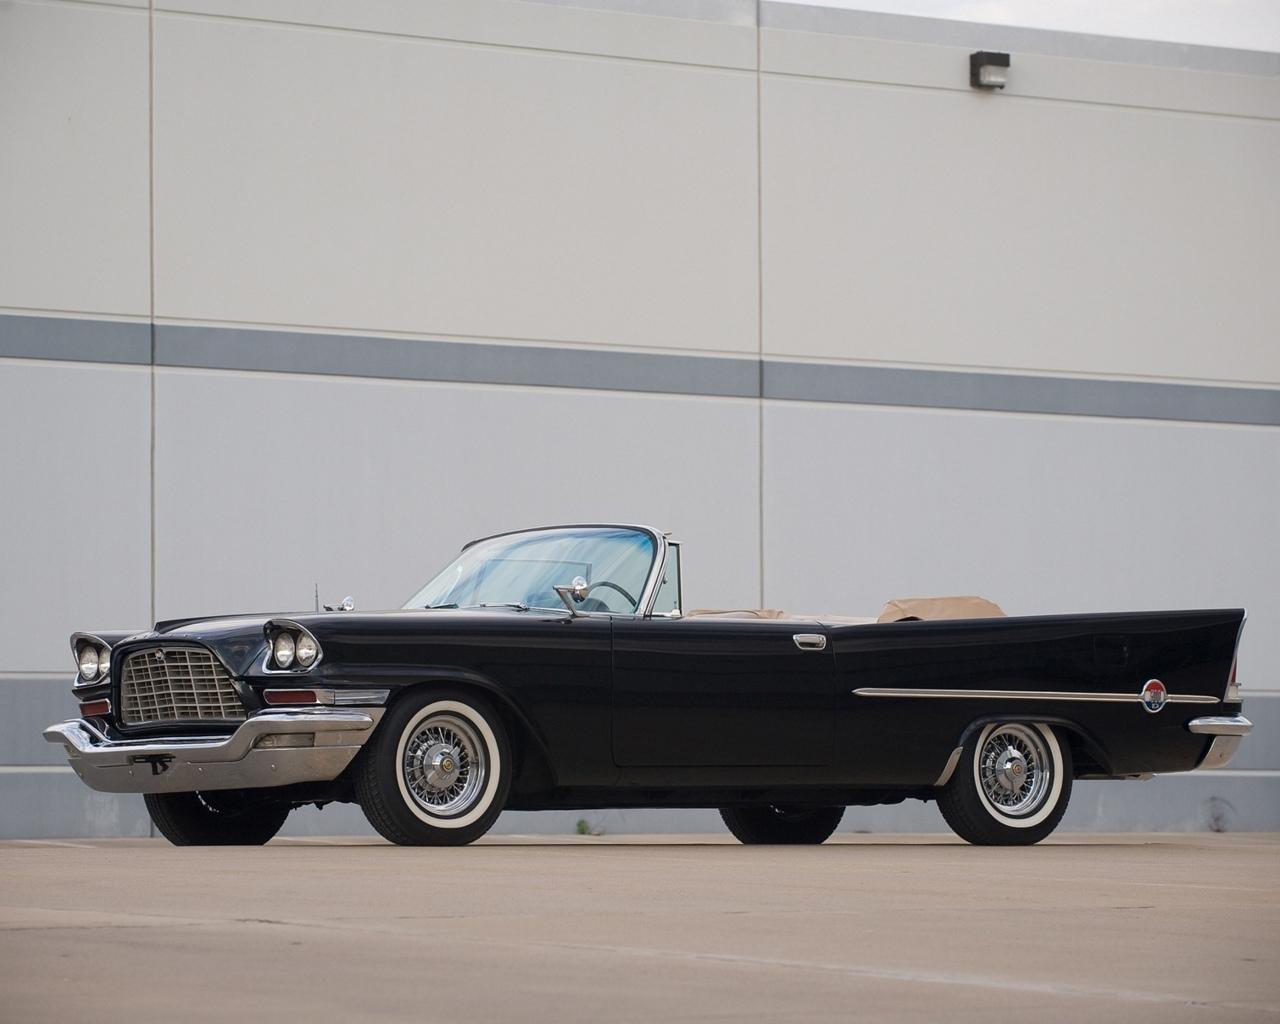 American Classic Car Wallpapers #1